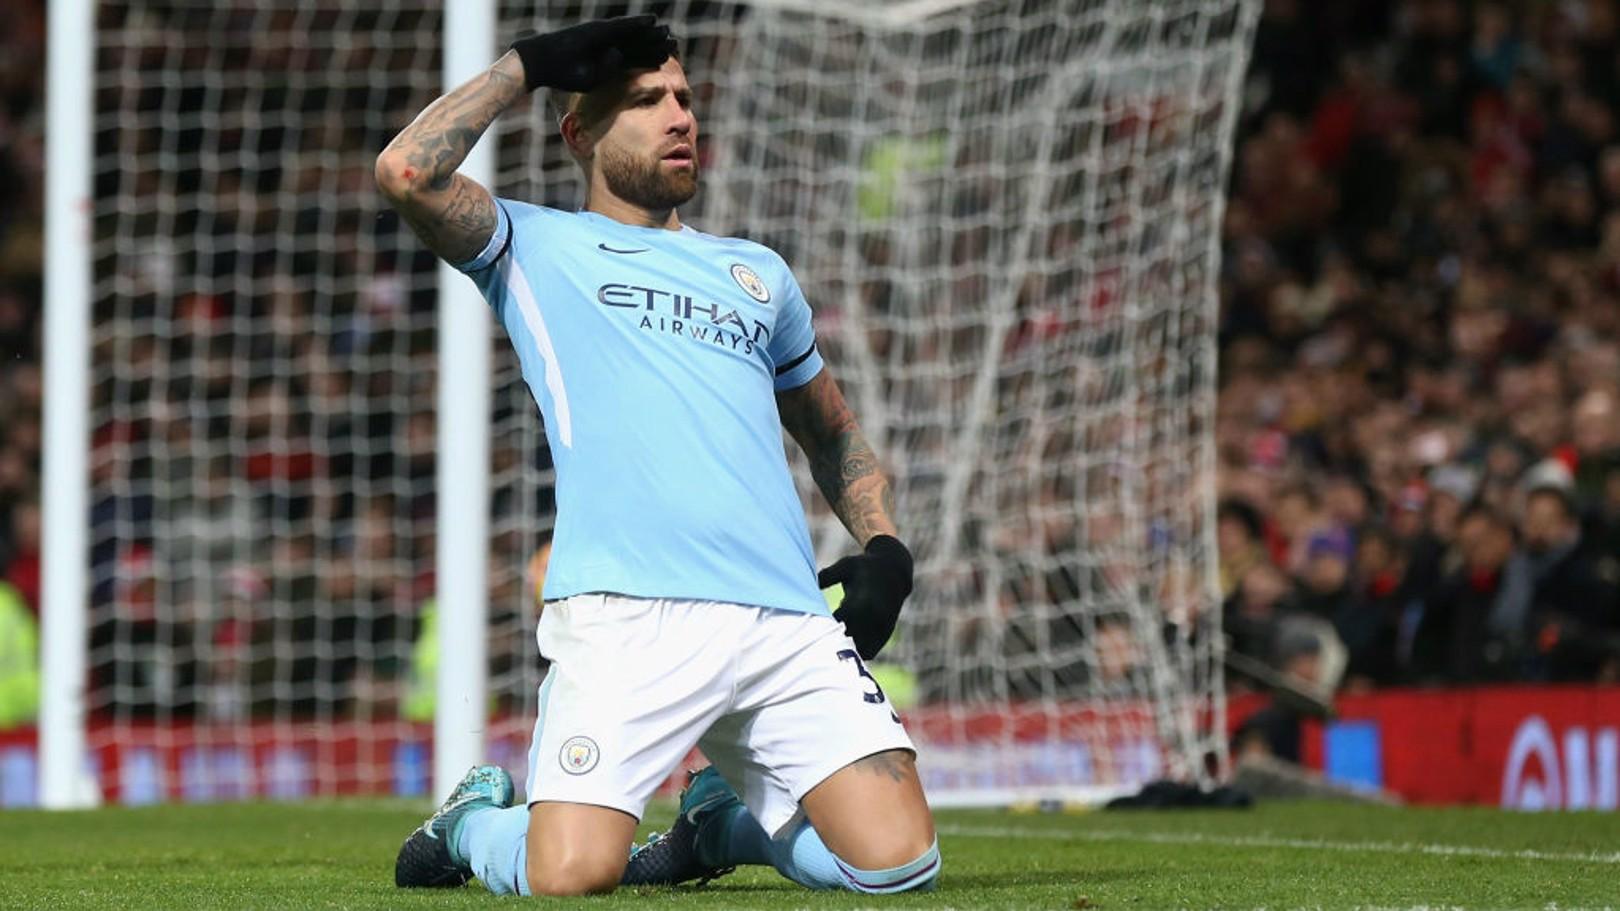 NICO OTAMENDI. El general celebra su decisivo gol en Old Trafford.